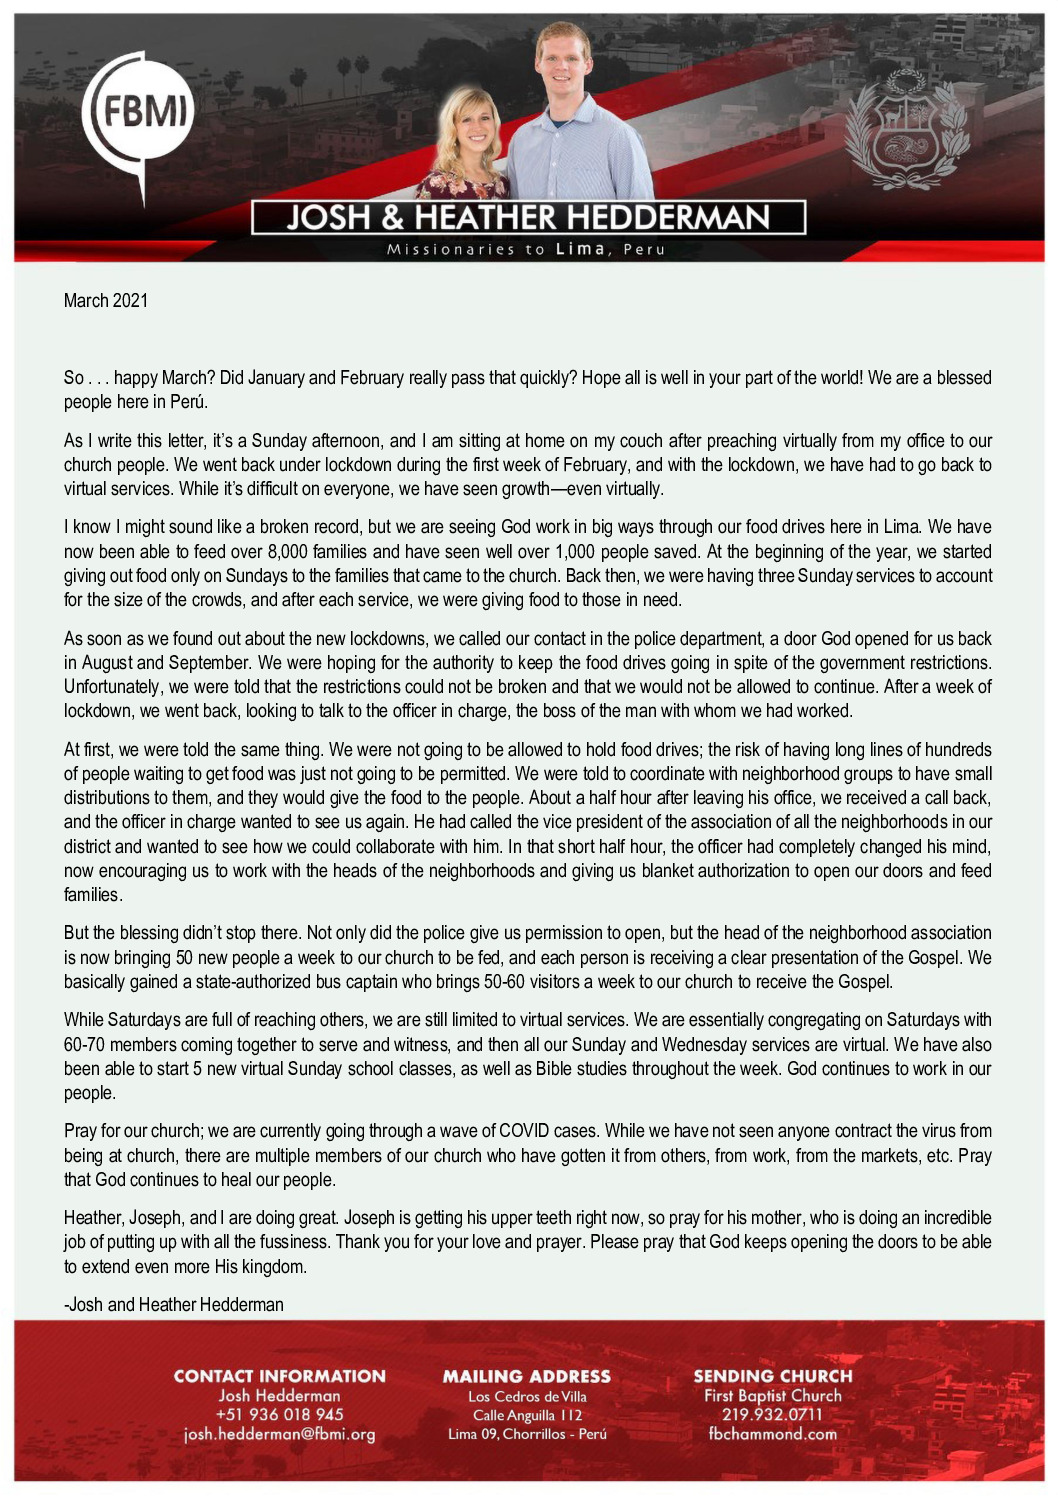 thumbnail of Josh Hedderman March 2021 Prayer Letter